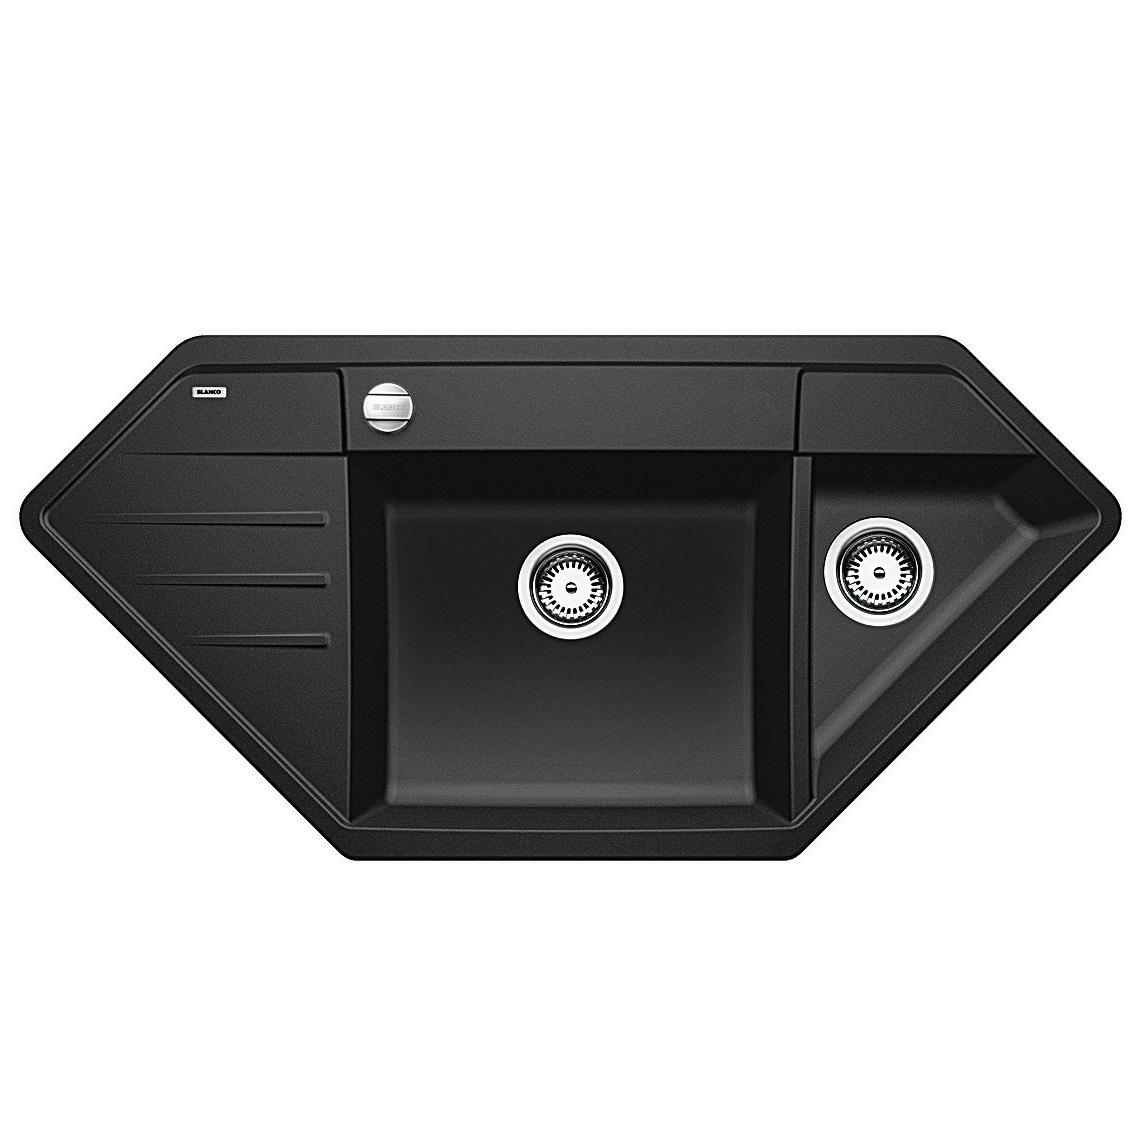 k chensp le dichtung wasserhahn k che erneuern. Black Bedroom Furniture Sets. Home Design Ideas